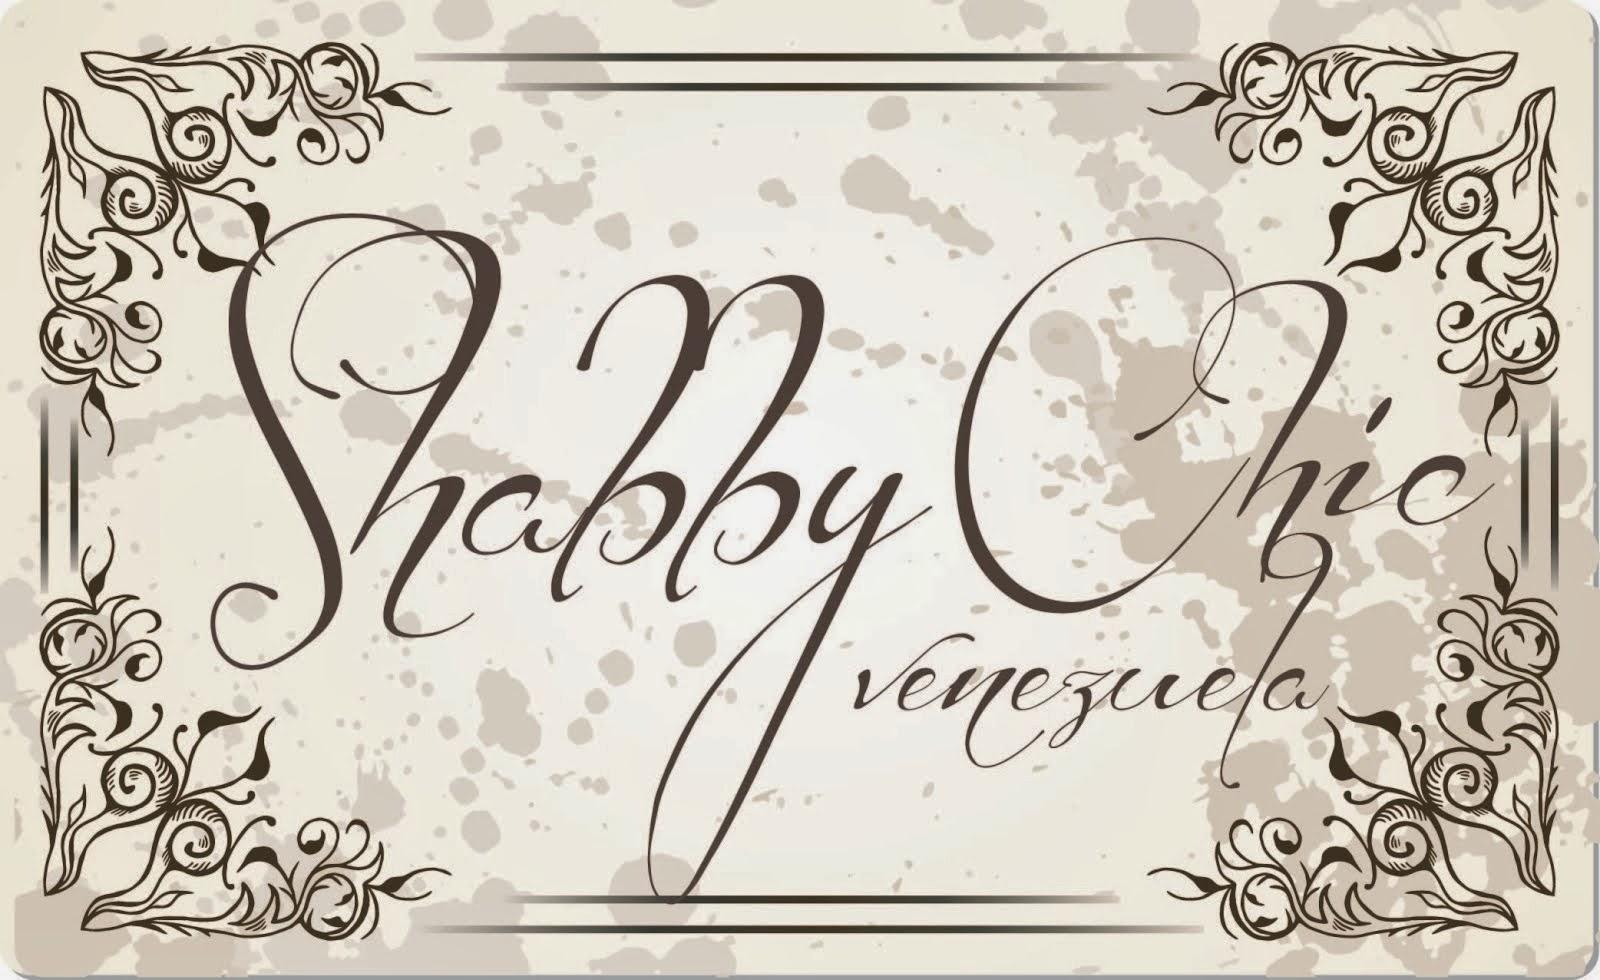 Shabby chic de viviana fortunato acerca de shabby chic for Grupo europa muebles